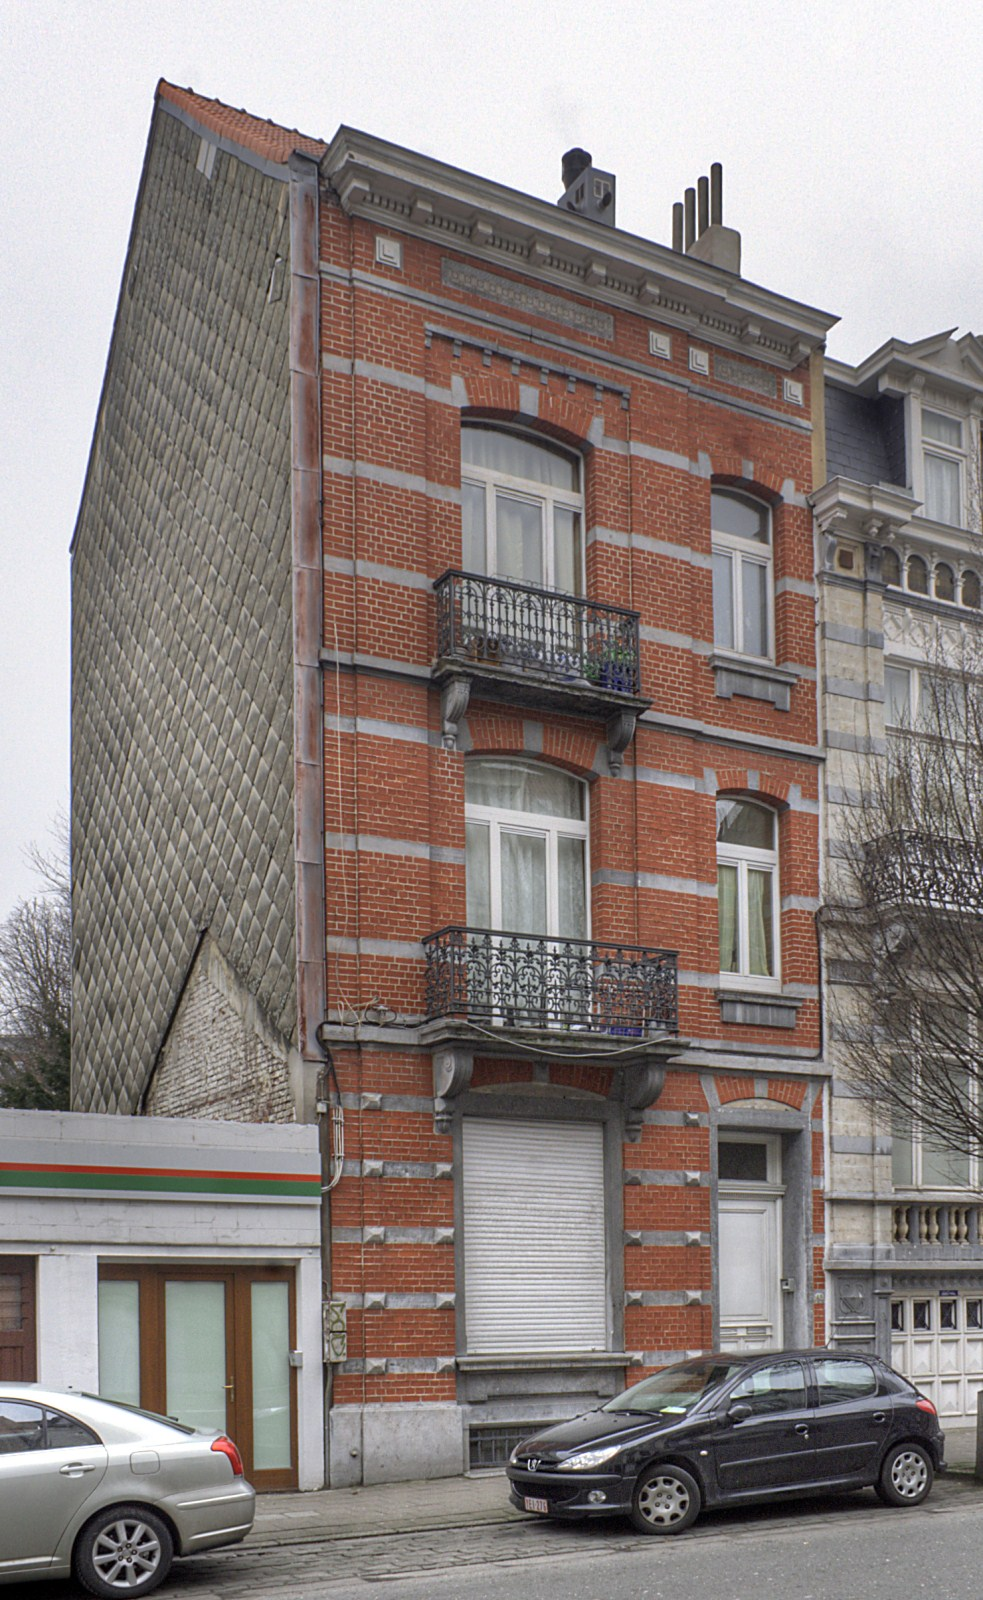 Franklinstraat 48.© © V. Brunetta & M. Eberlin, 2009